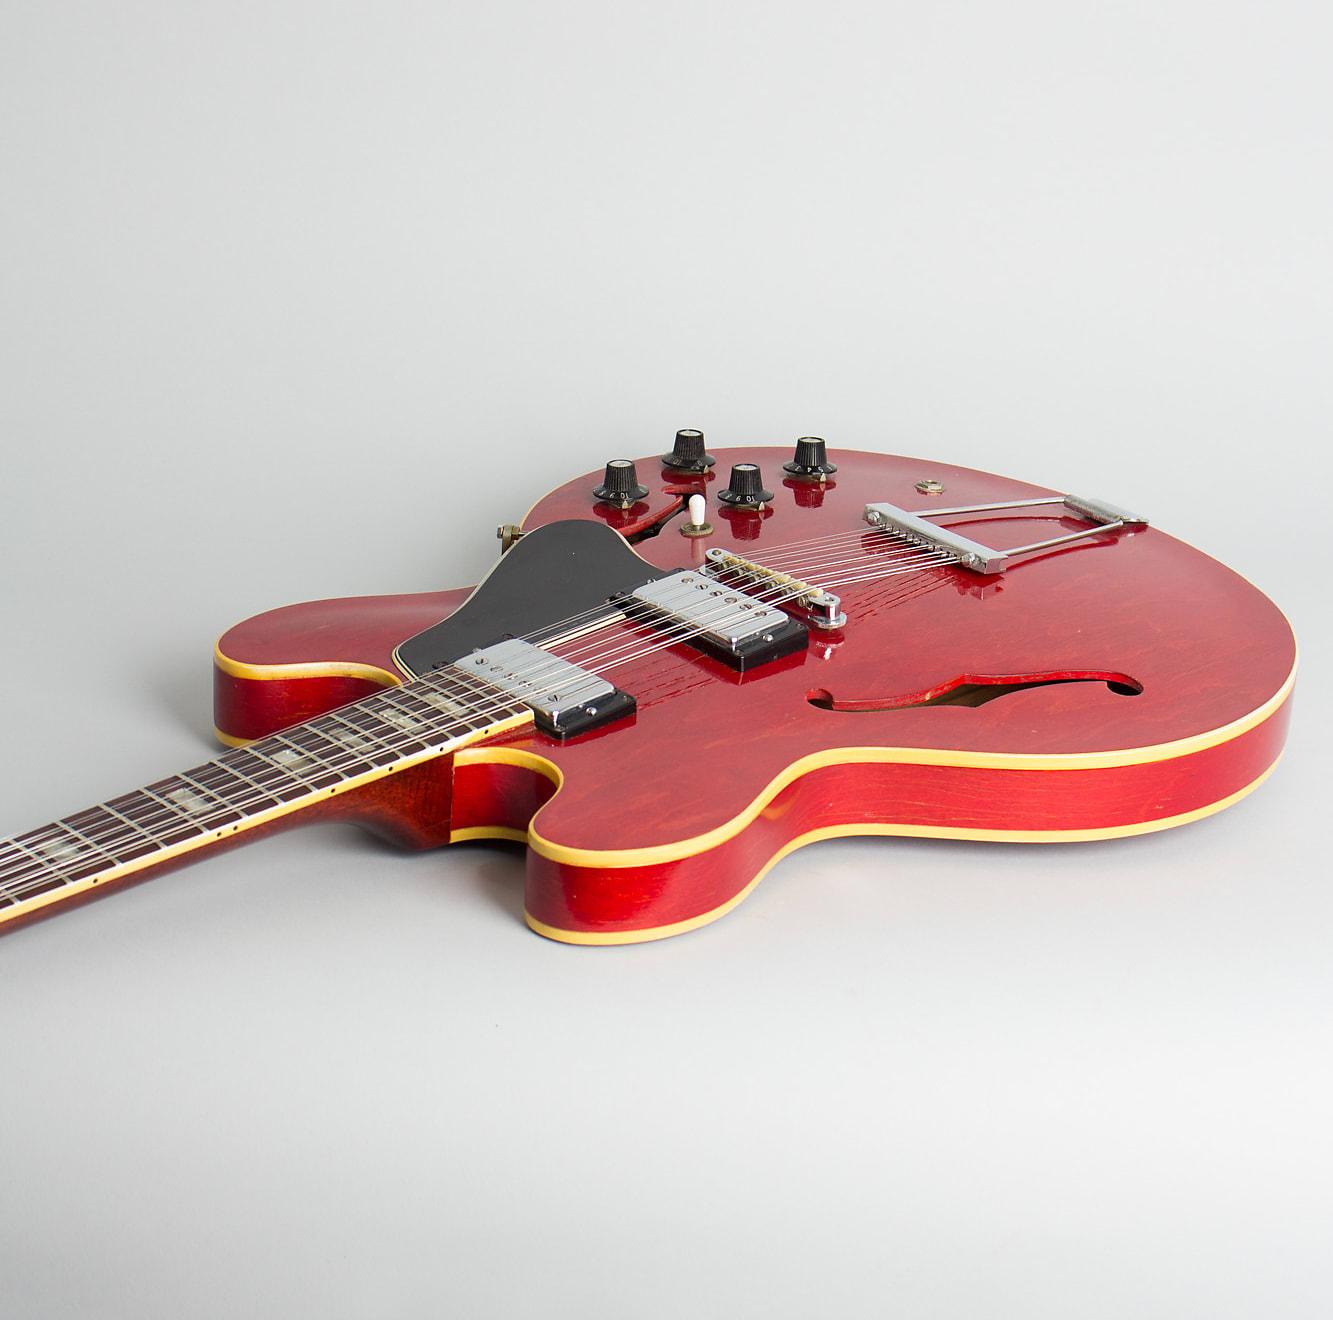 Gibson  ES-335-12 12 String Semi-Hollow Body Electric Guitar (1967), ser. #118815, brown hard shell case.